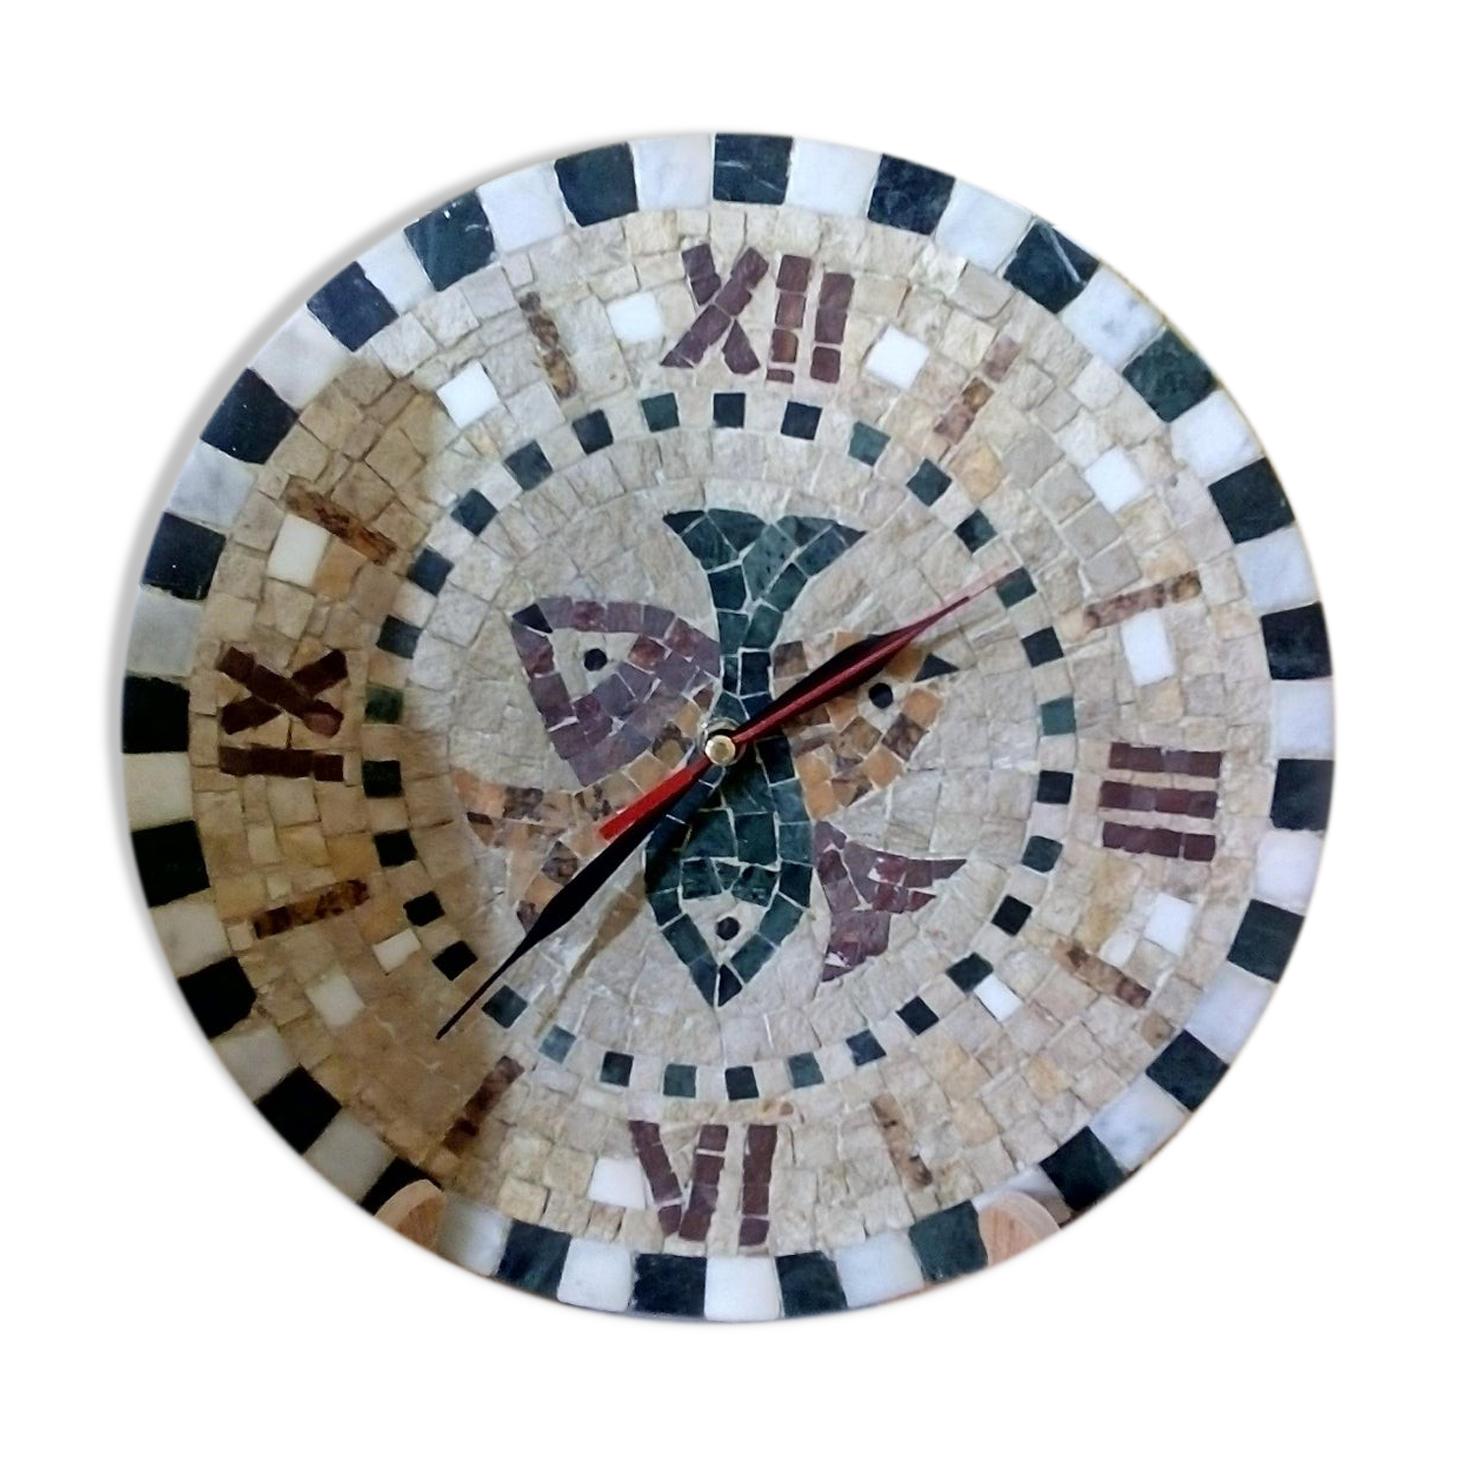 Horloge murale en mosaïque romaine